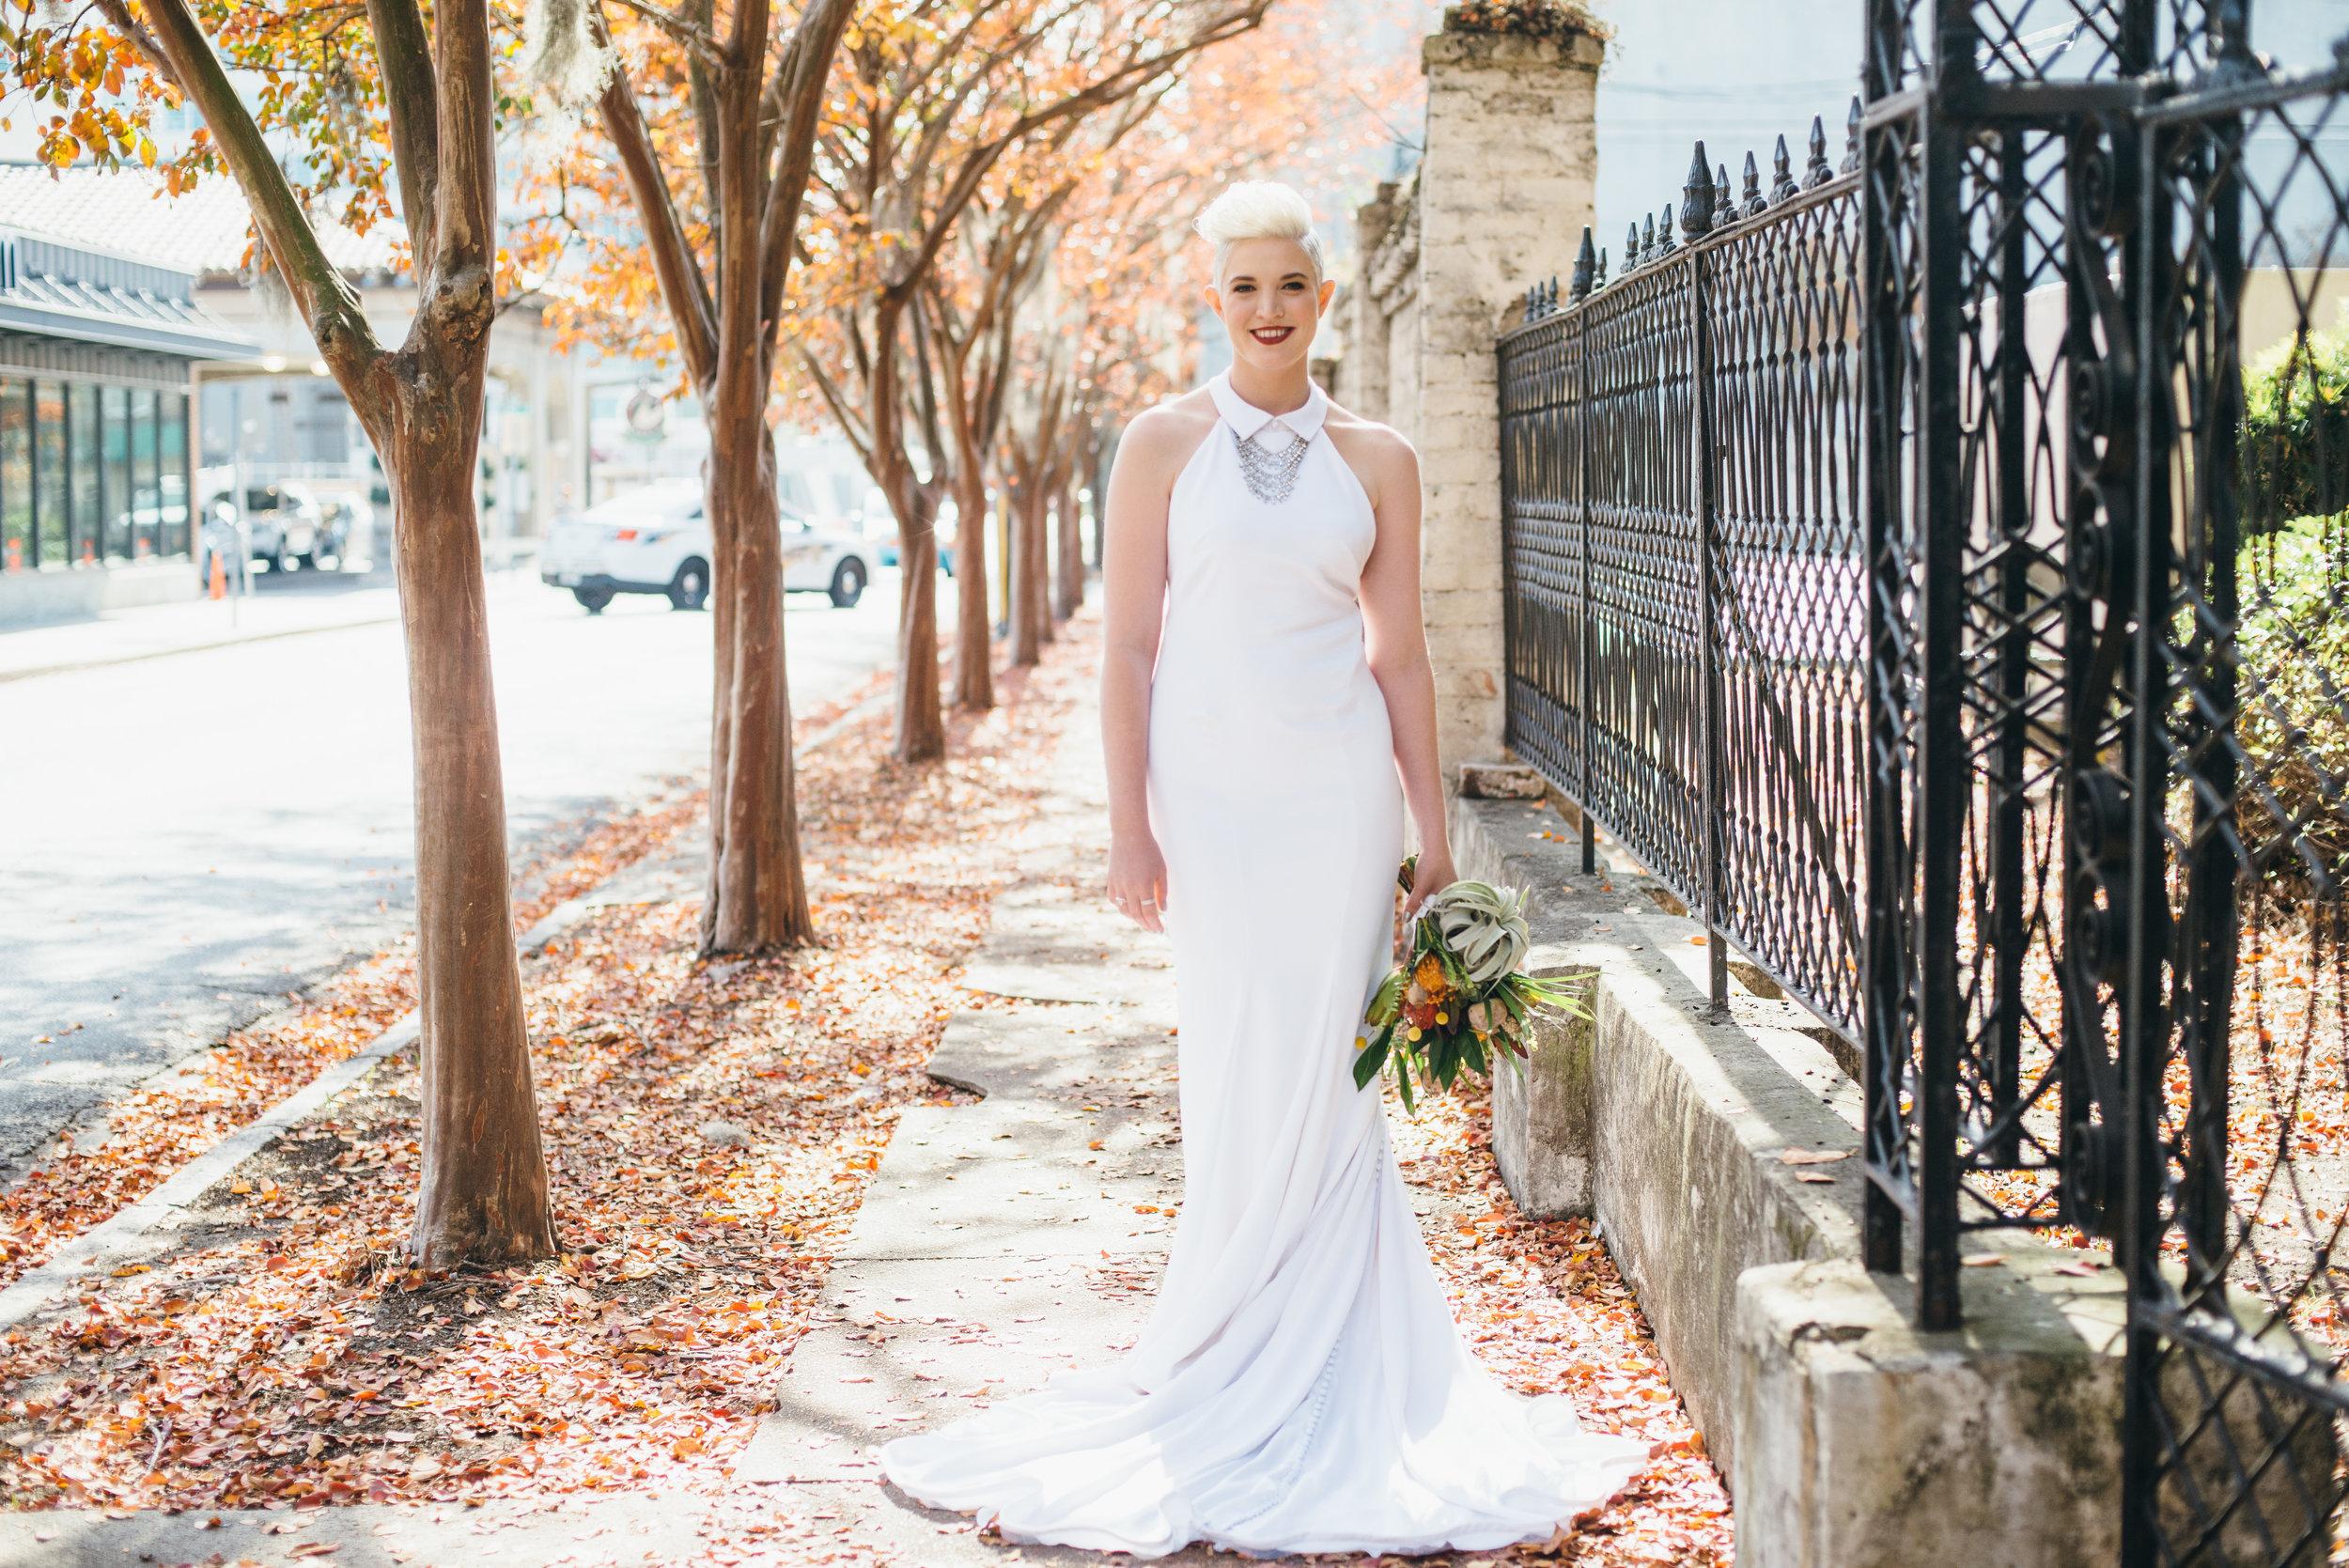 julia-hembree-photography-eden-village-church-wedding-savannah-warehouse-wedding-ivory-and-beau-bridal-boutique-savannah-florist-savannah-wedding-planner-savannah-event-design-scad-wedding-artist-wedding-savannah-funky-wedding-handmade-wedding-25.jpg